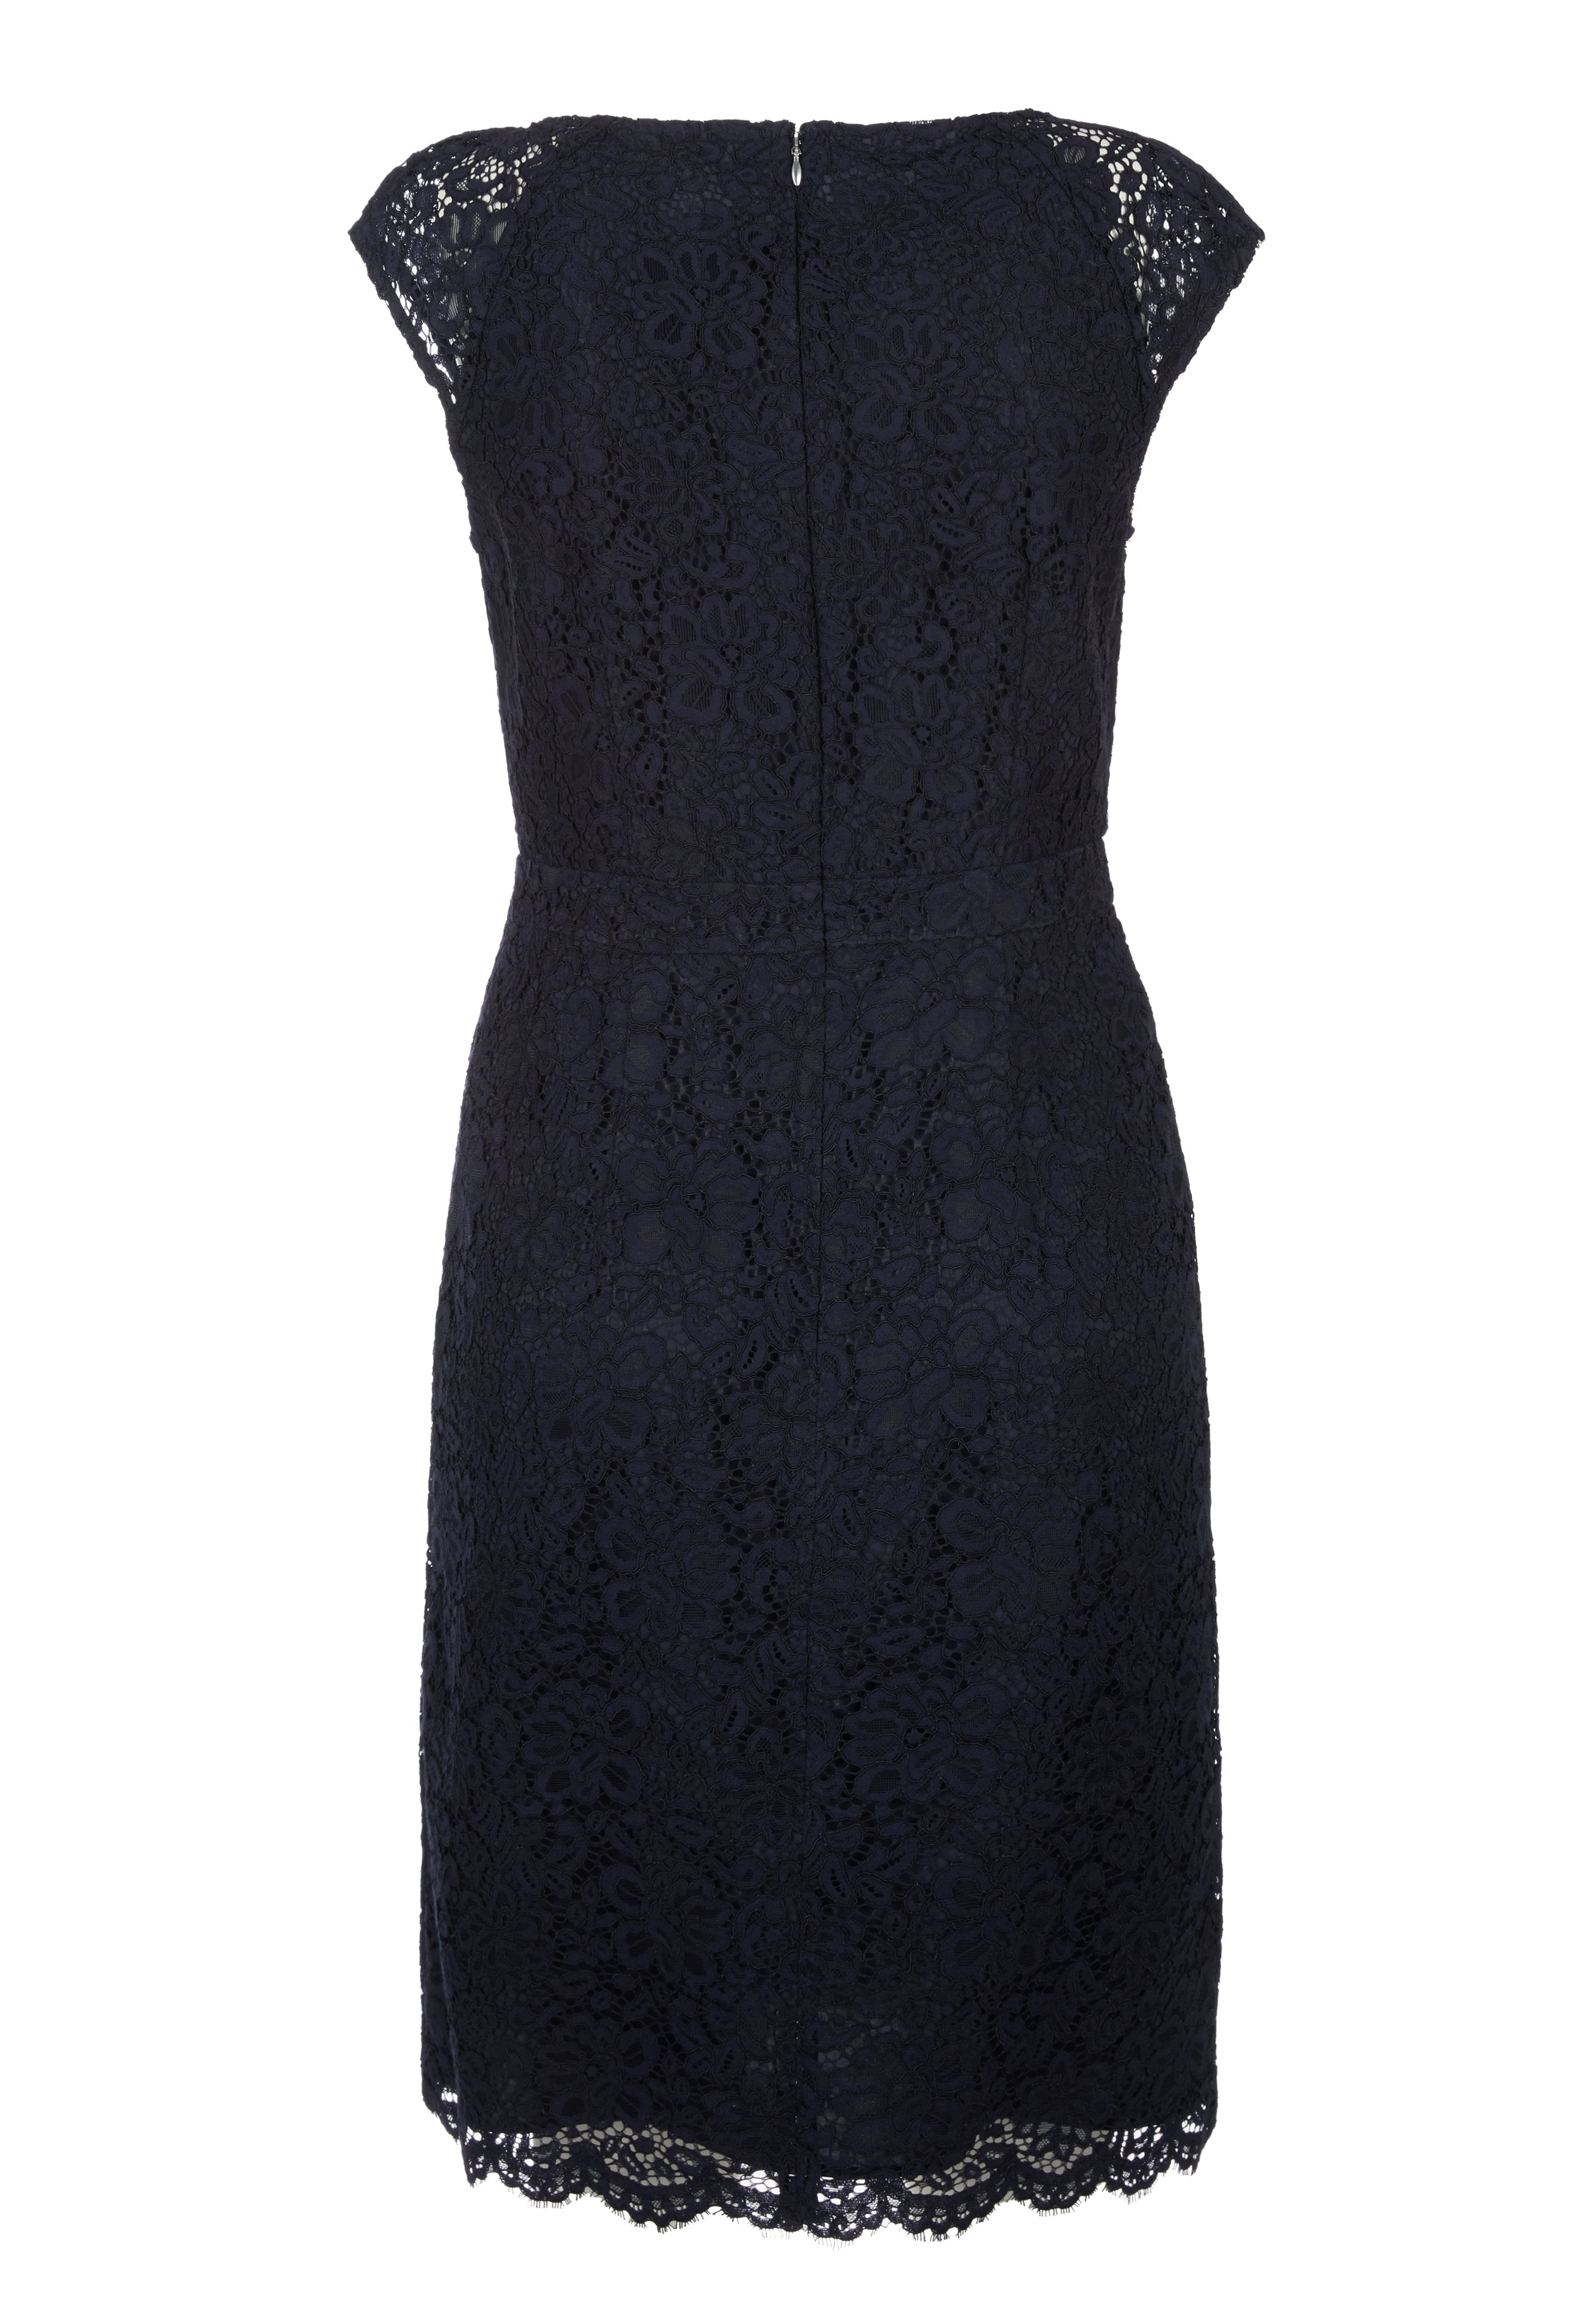 s.oliver kurzes kleid aus blÜtenspitze - cocktail dress